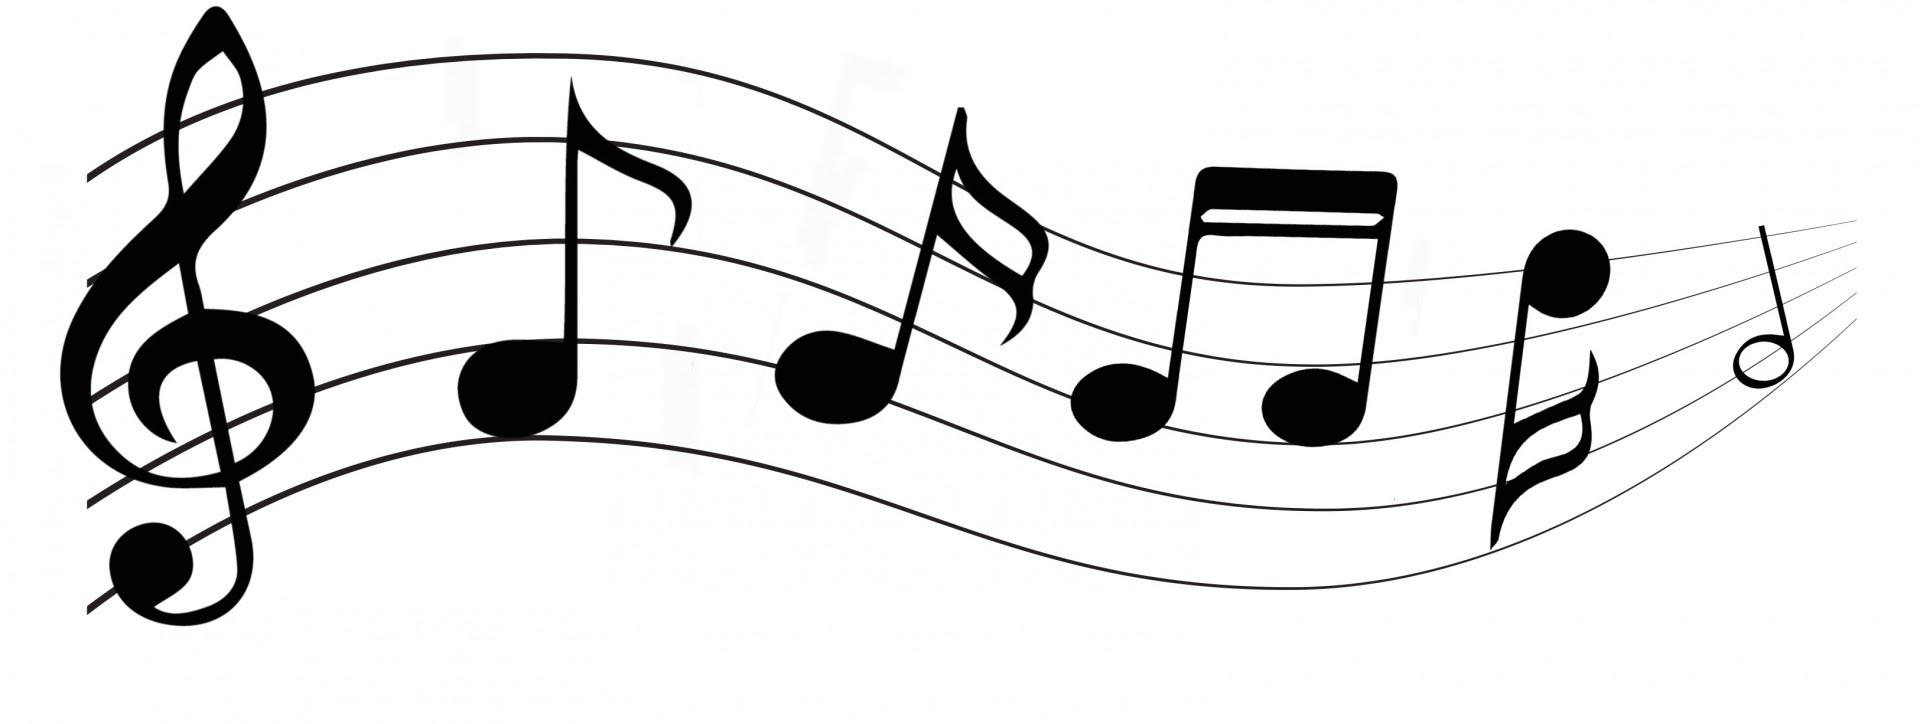 Band clipart pep band. Videos hudsonville bands videospep